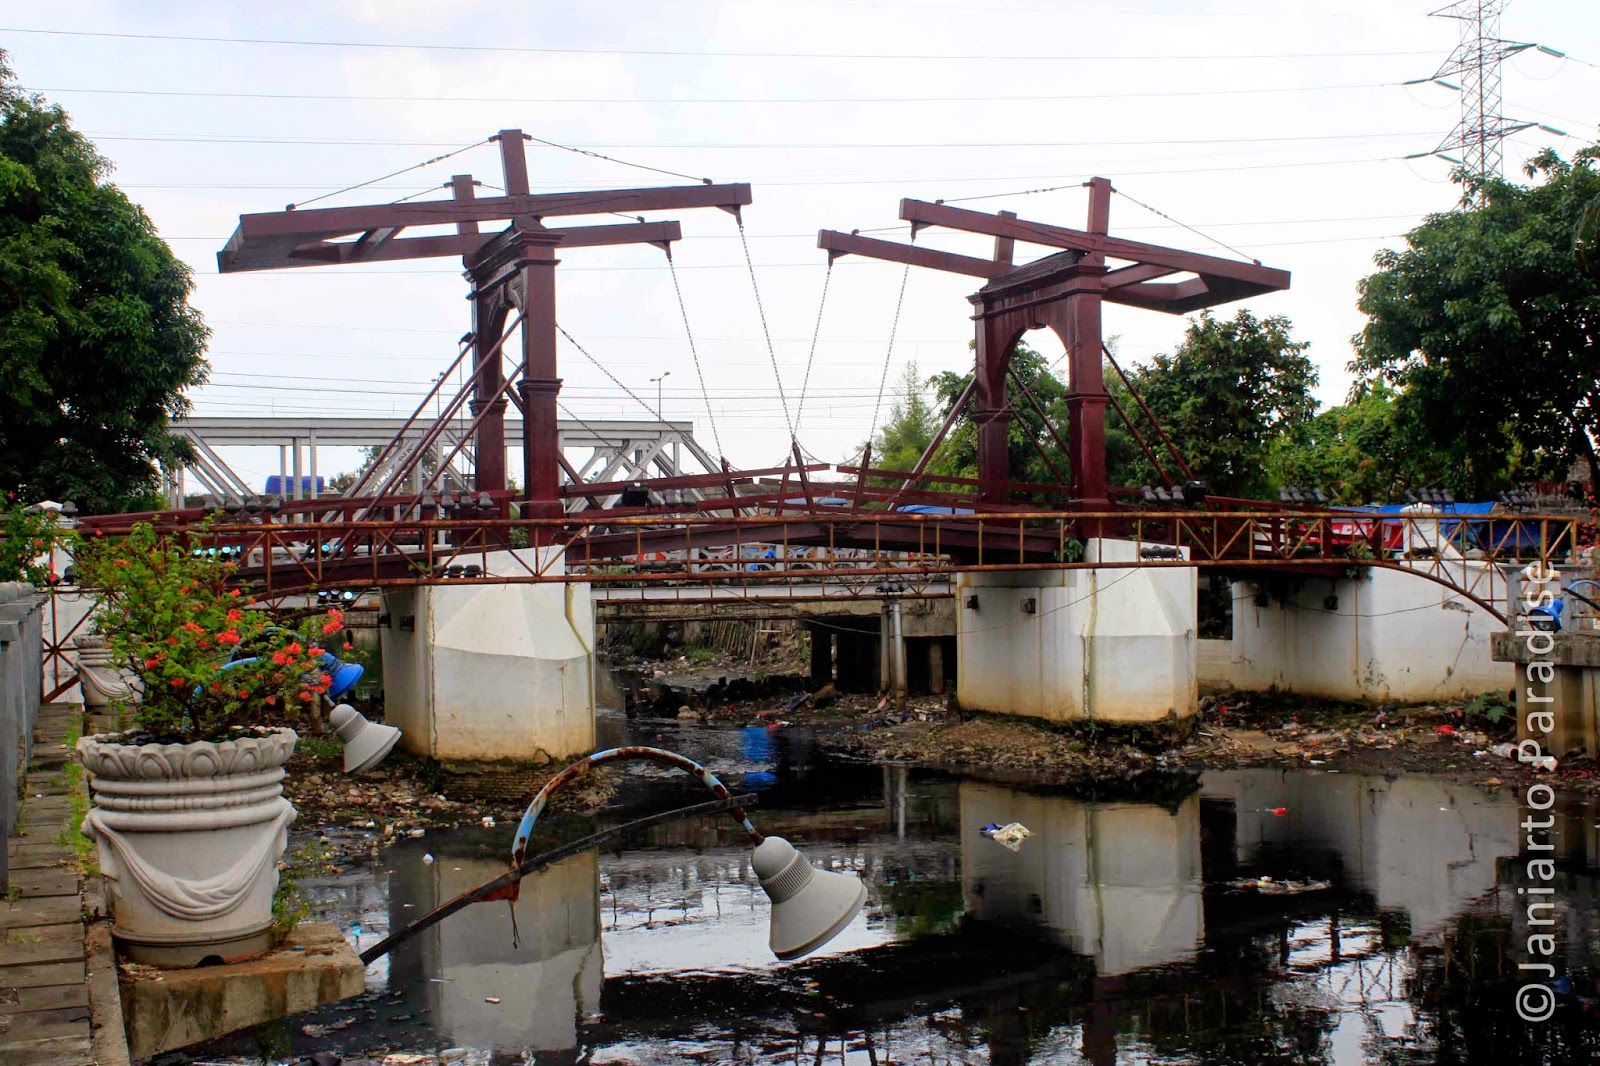 Kota Intan Bridge; Jakarta Old City; Kali Besar